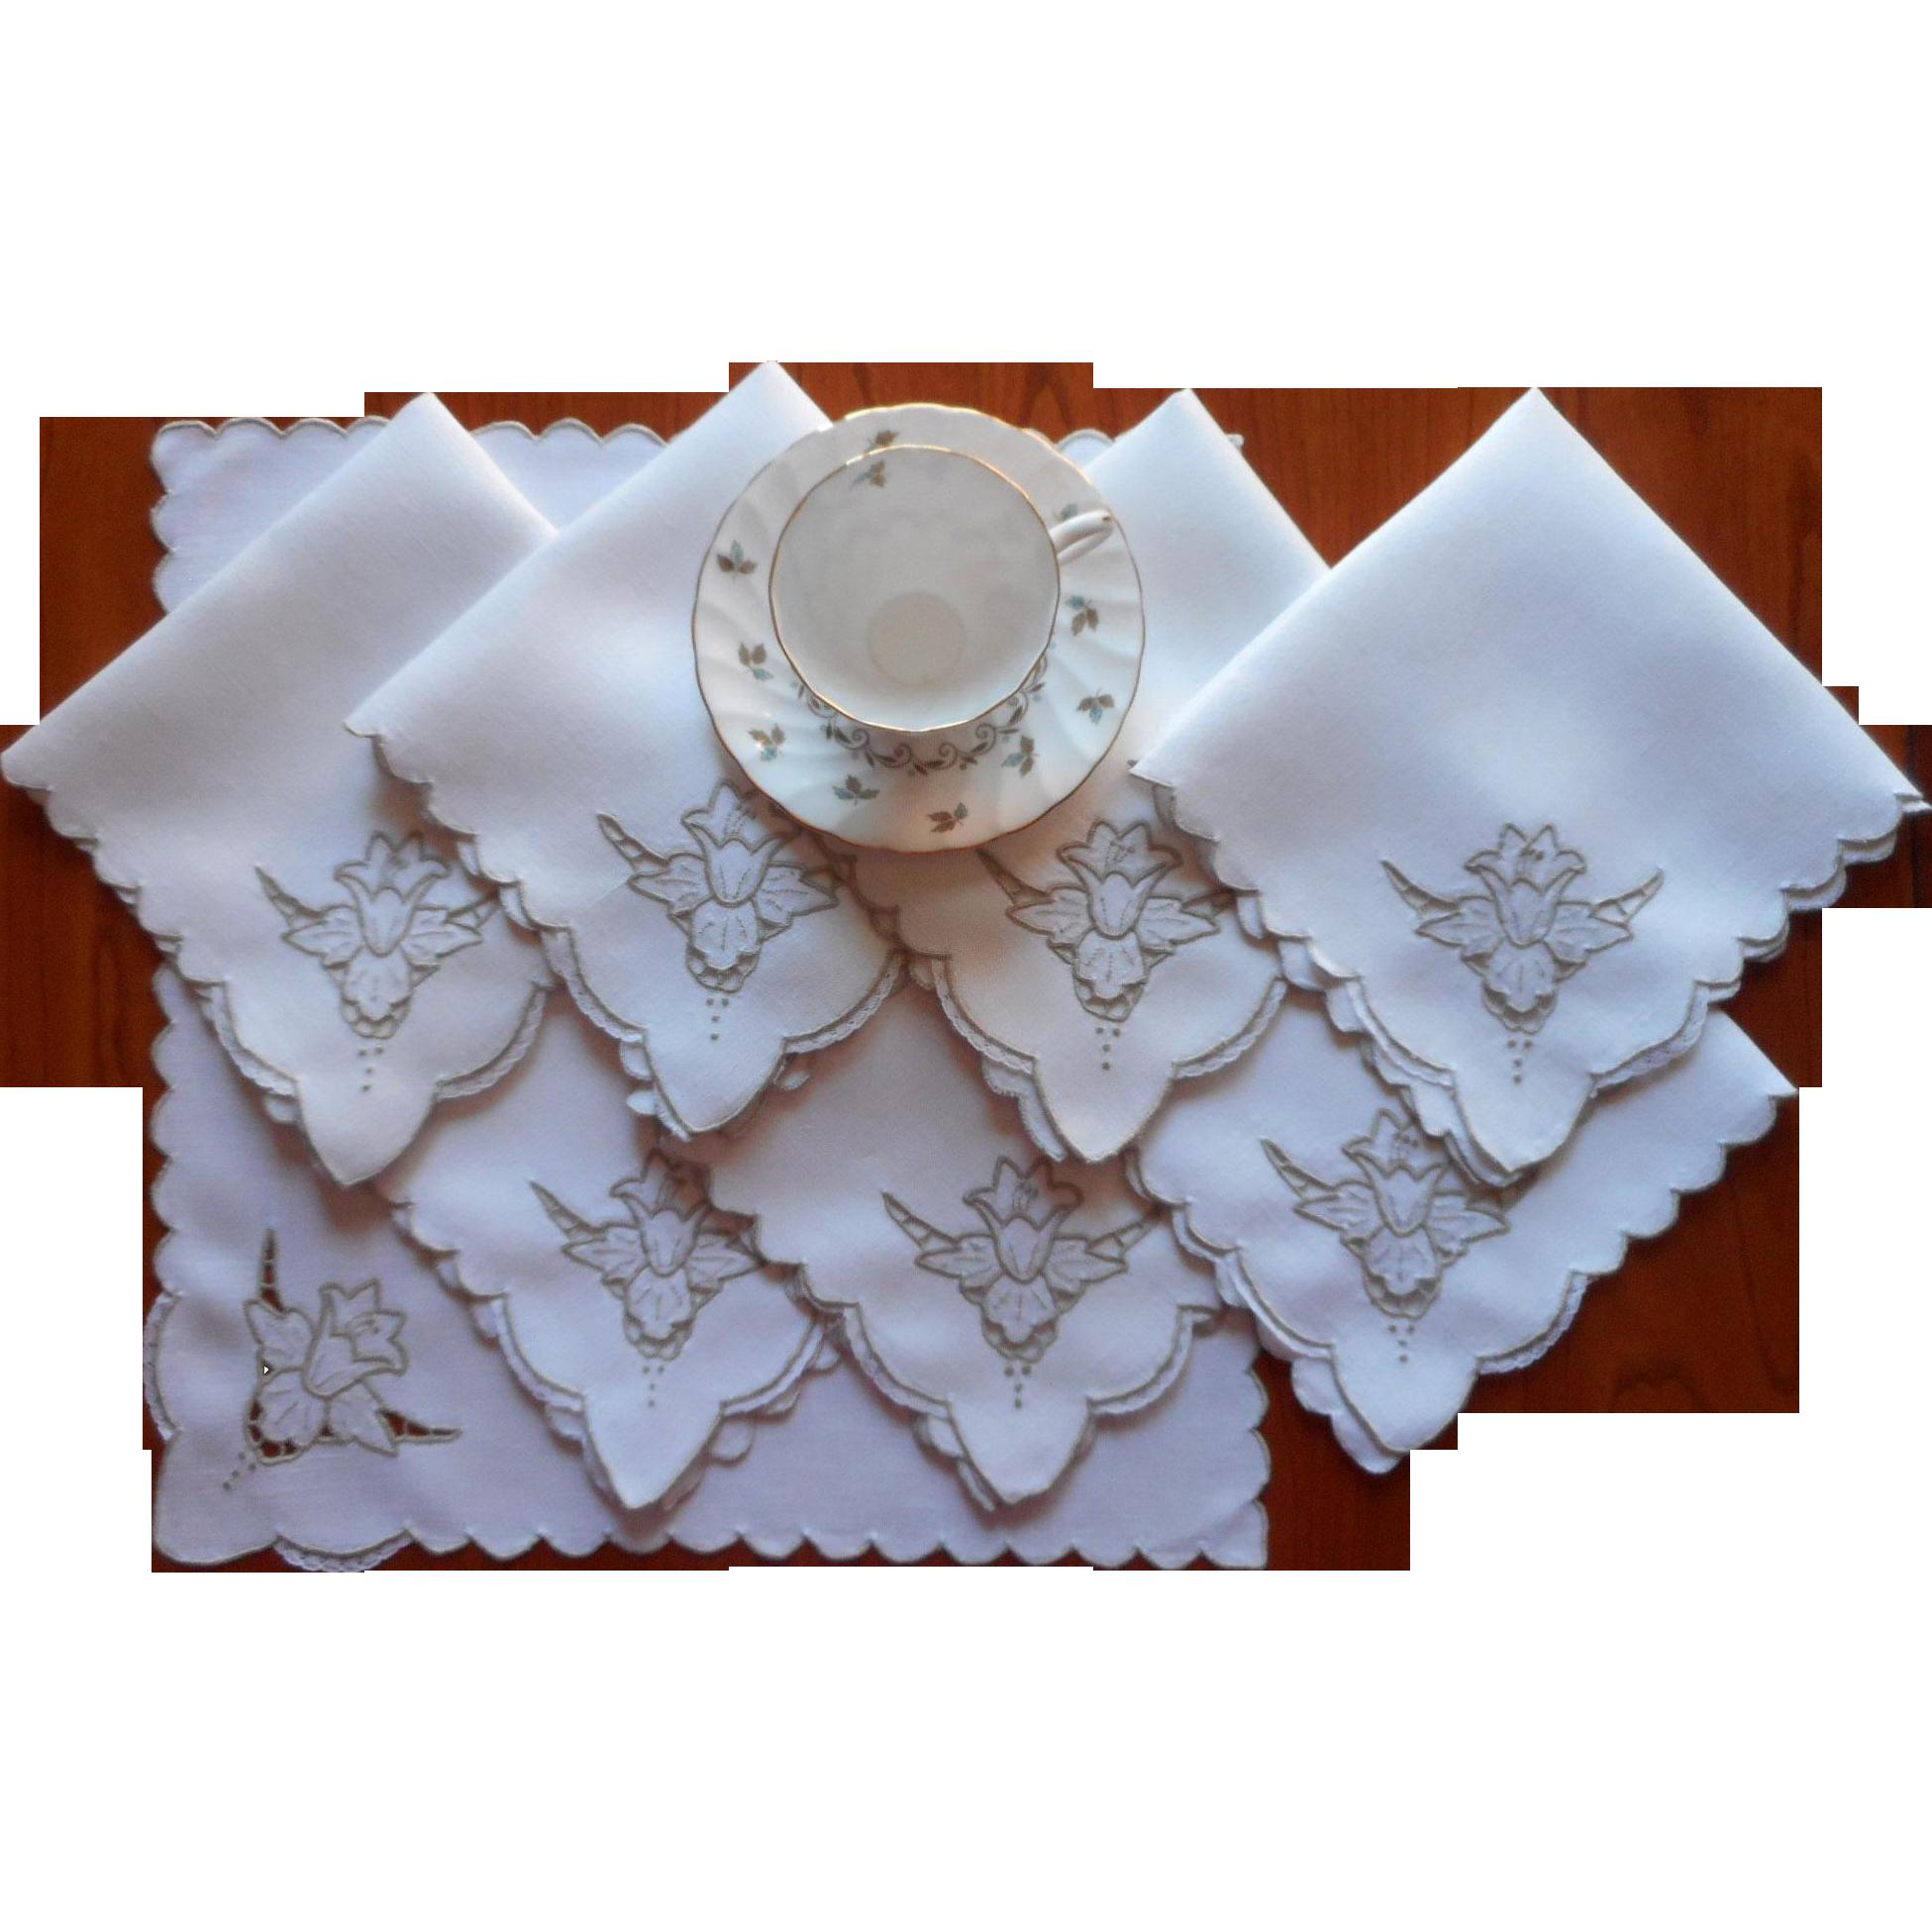 Cutwork linen madeira napkins vintage ecru hand embroidery for Glass cut work designs